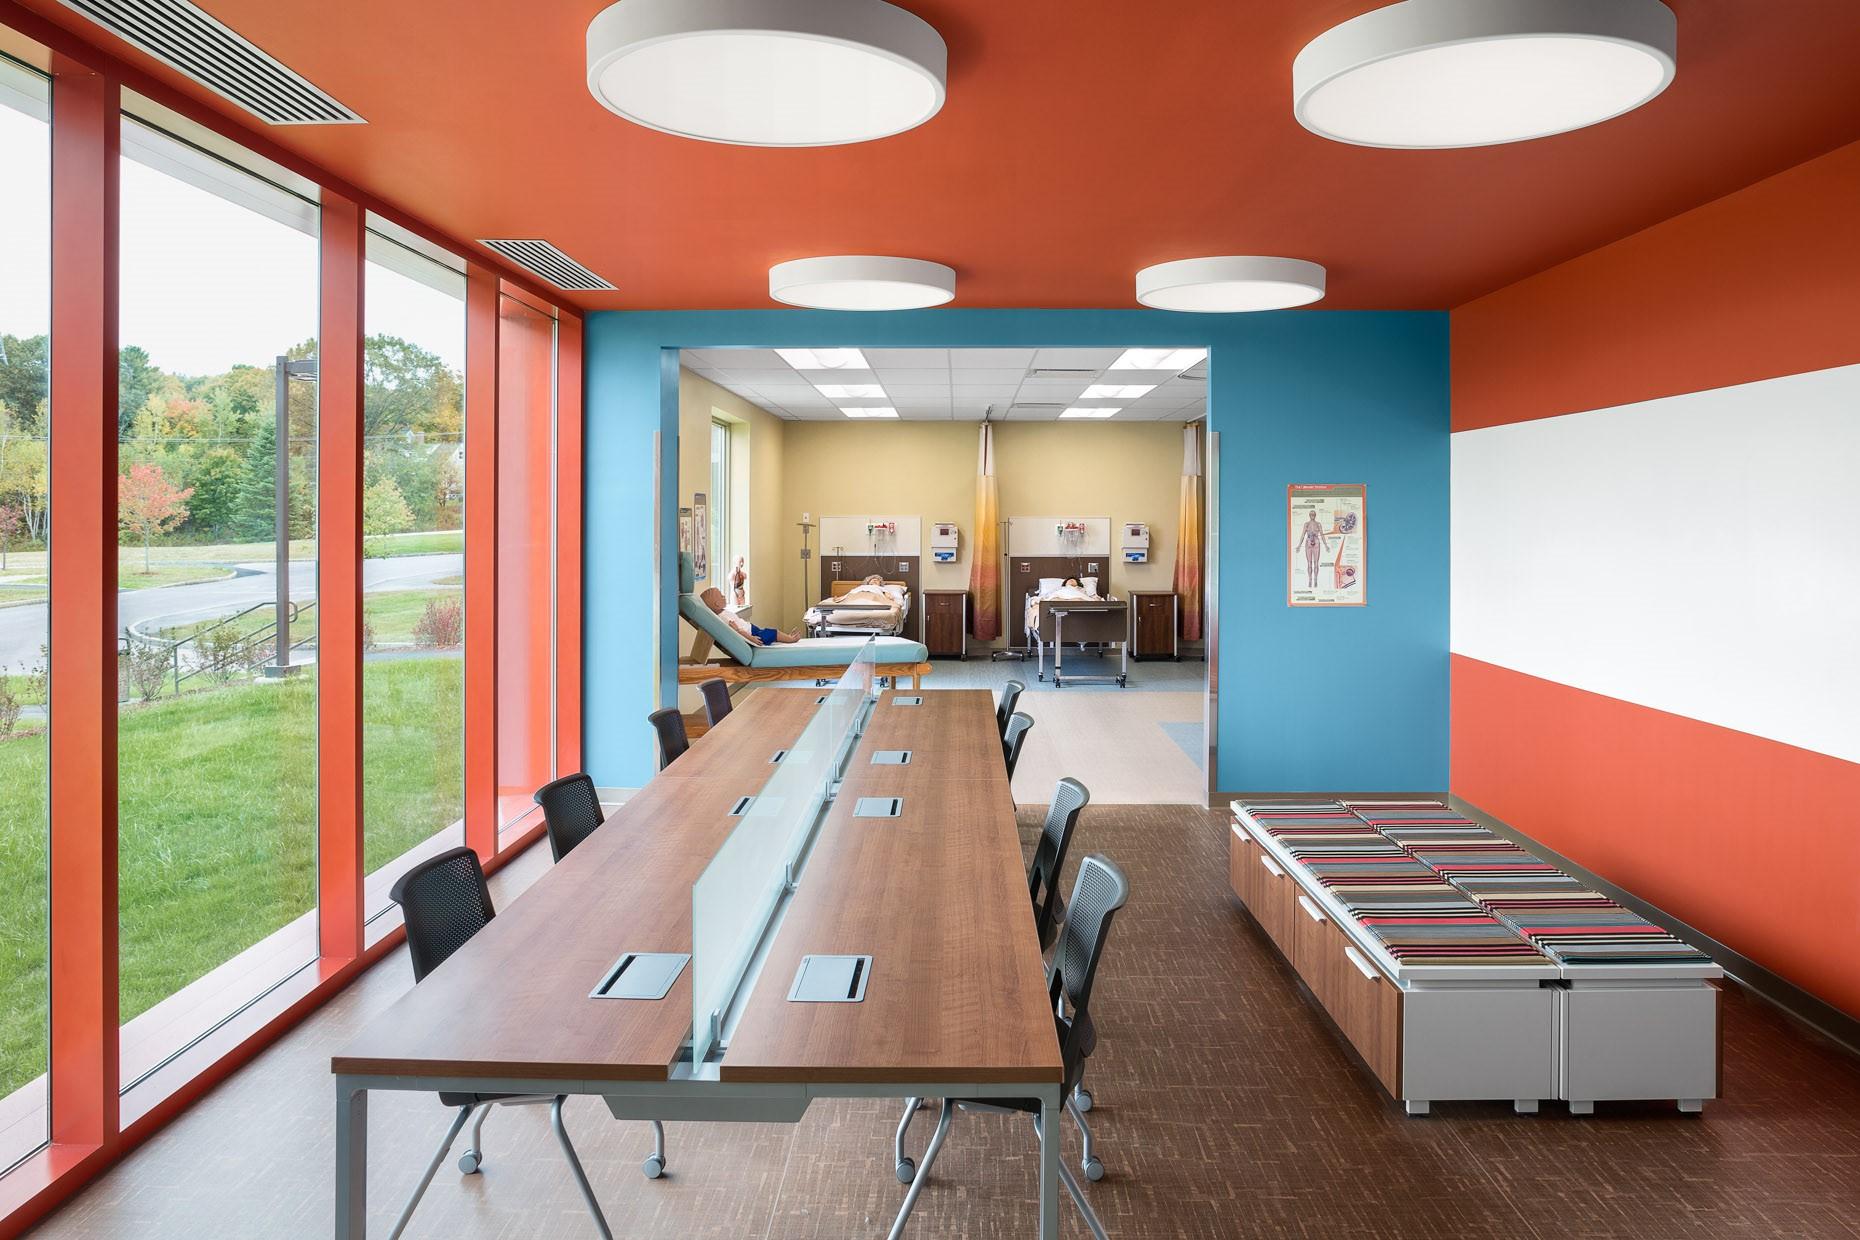 desk chair groupon tropitone lounge chairs 5 office design ideas on a budget   arthur p. o'hara